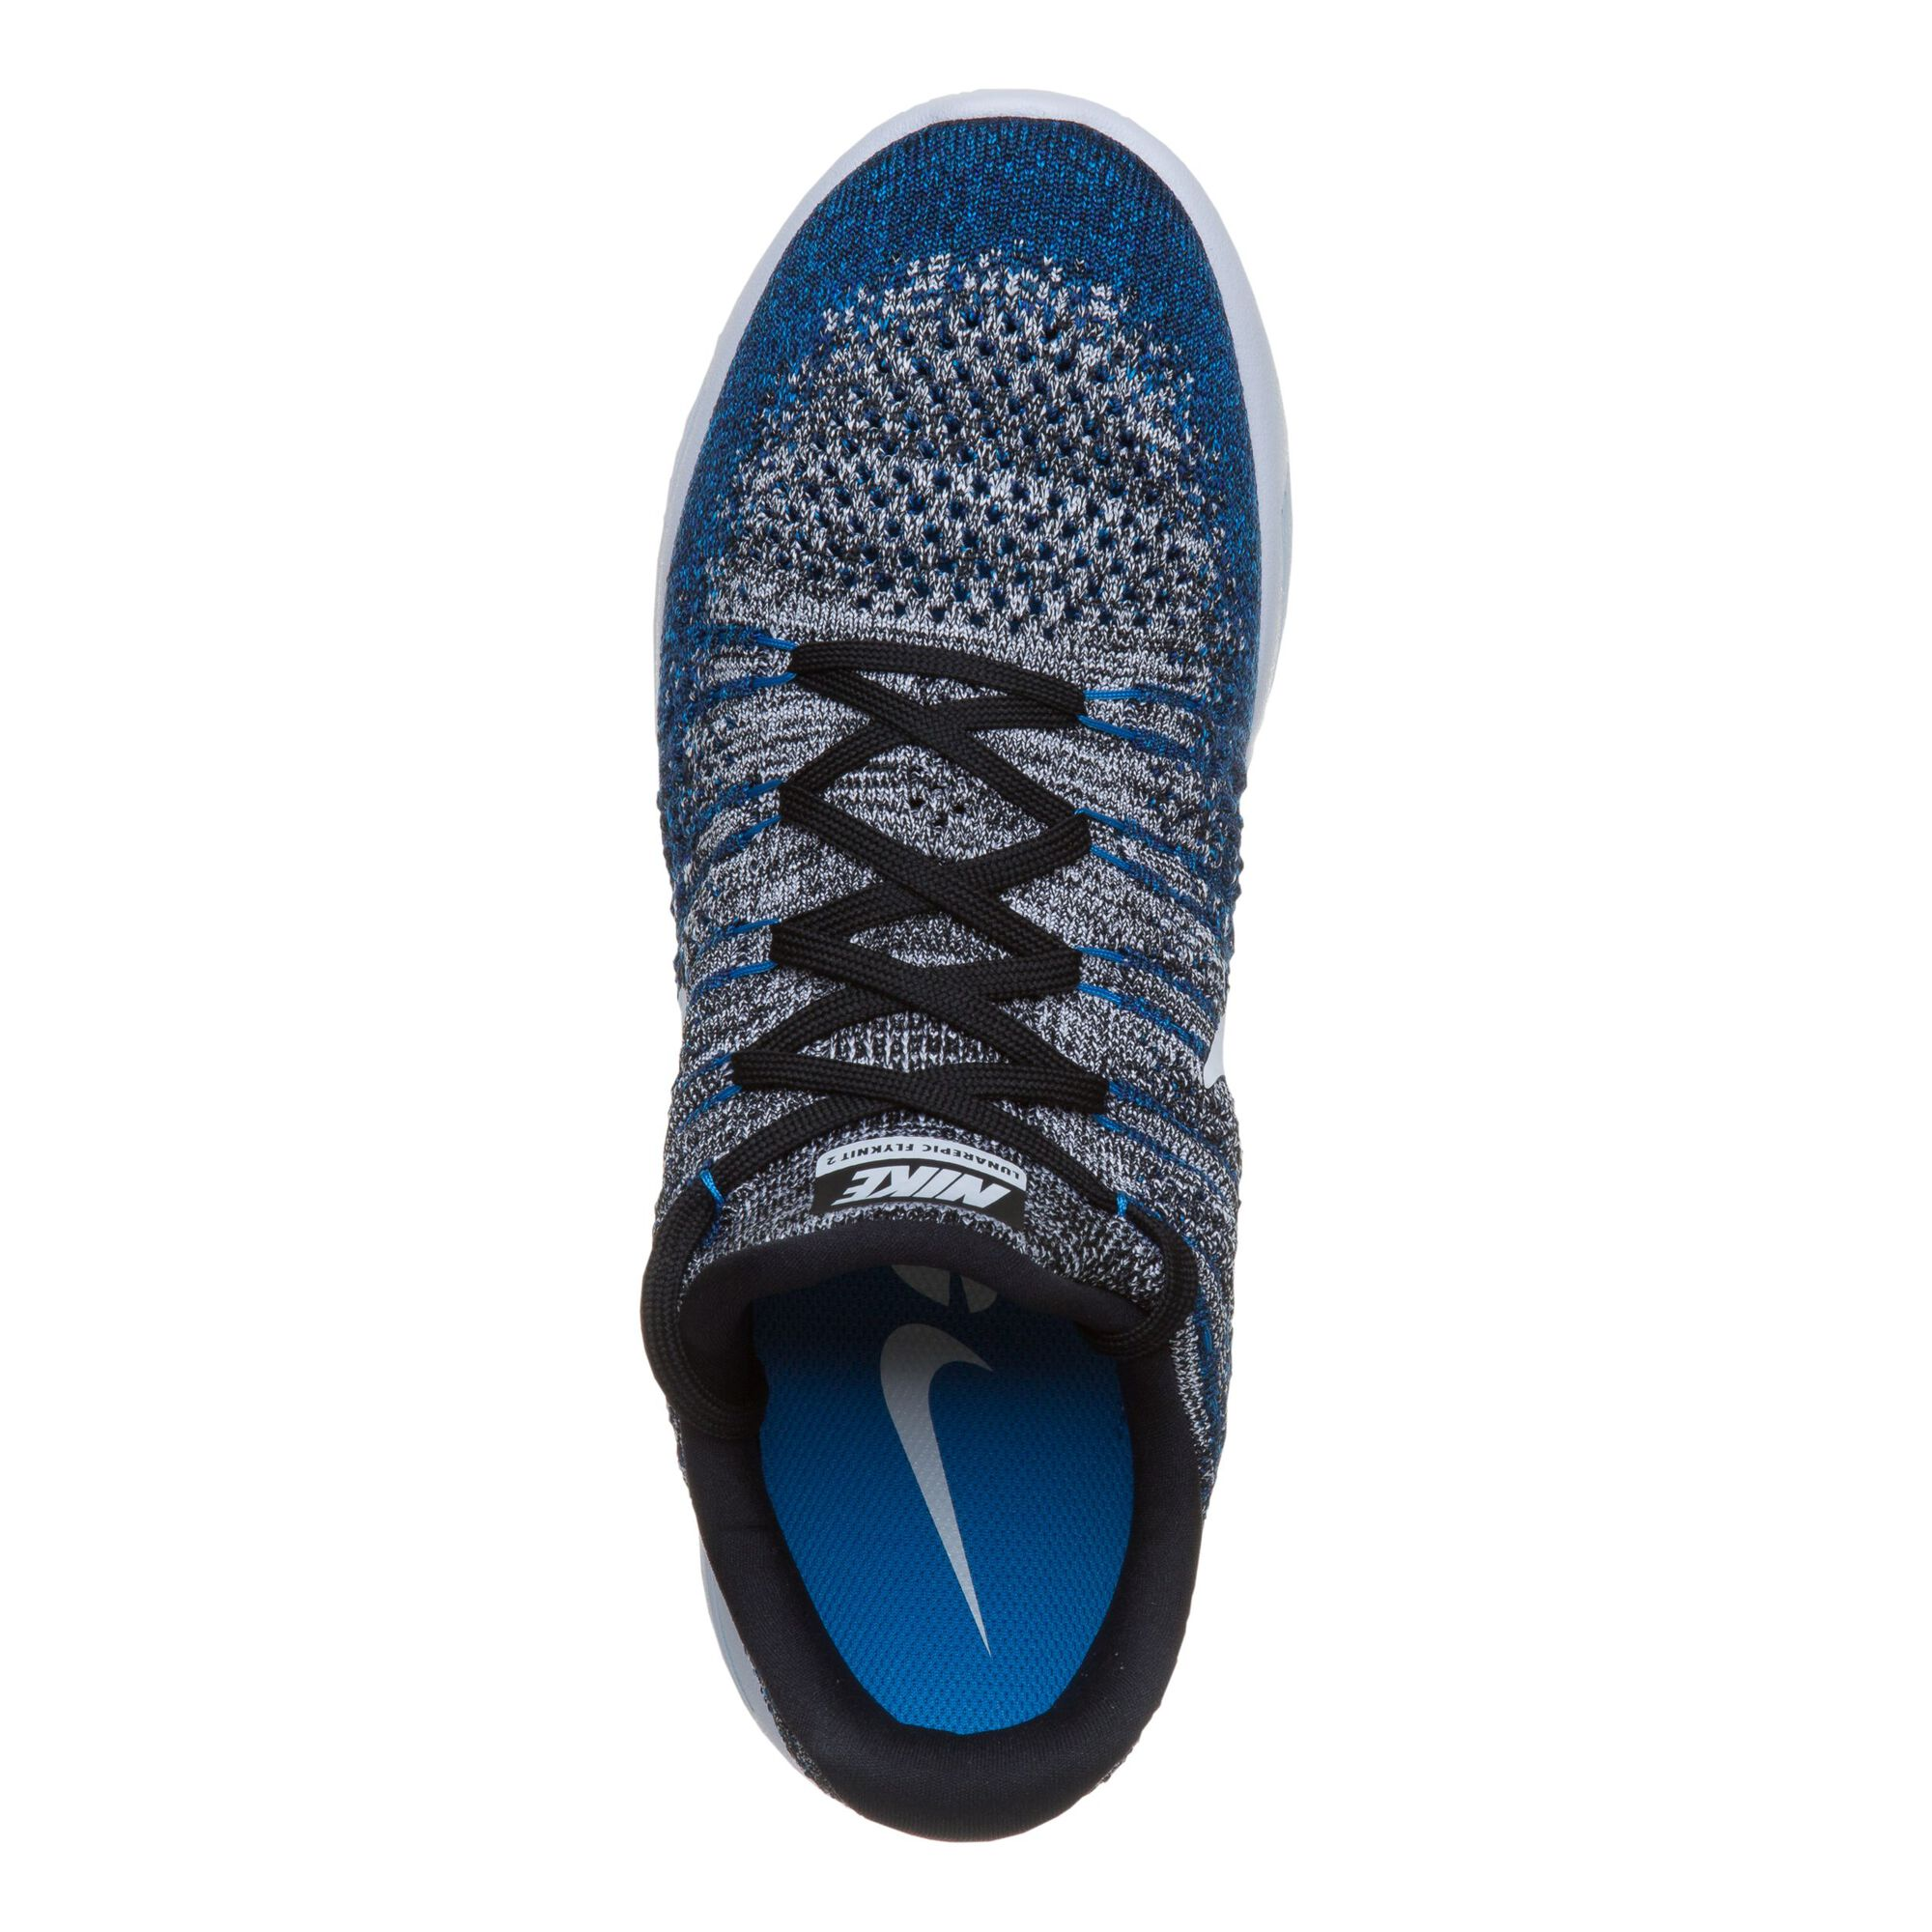 c6150f20bca4 buy Nike LunarEpic Flyknit 2 Neutral Running Shoe Men - Black